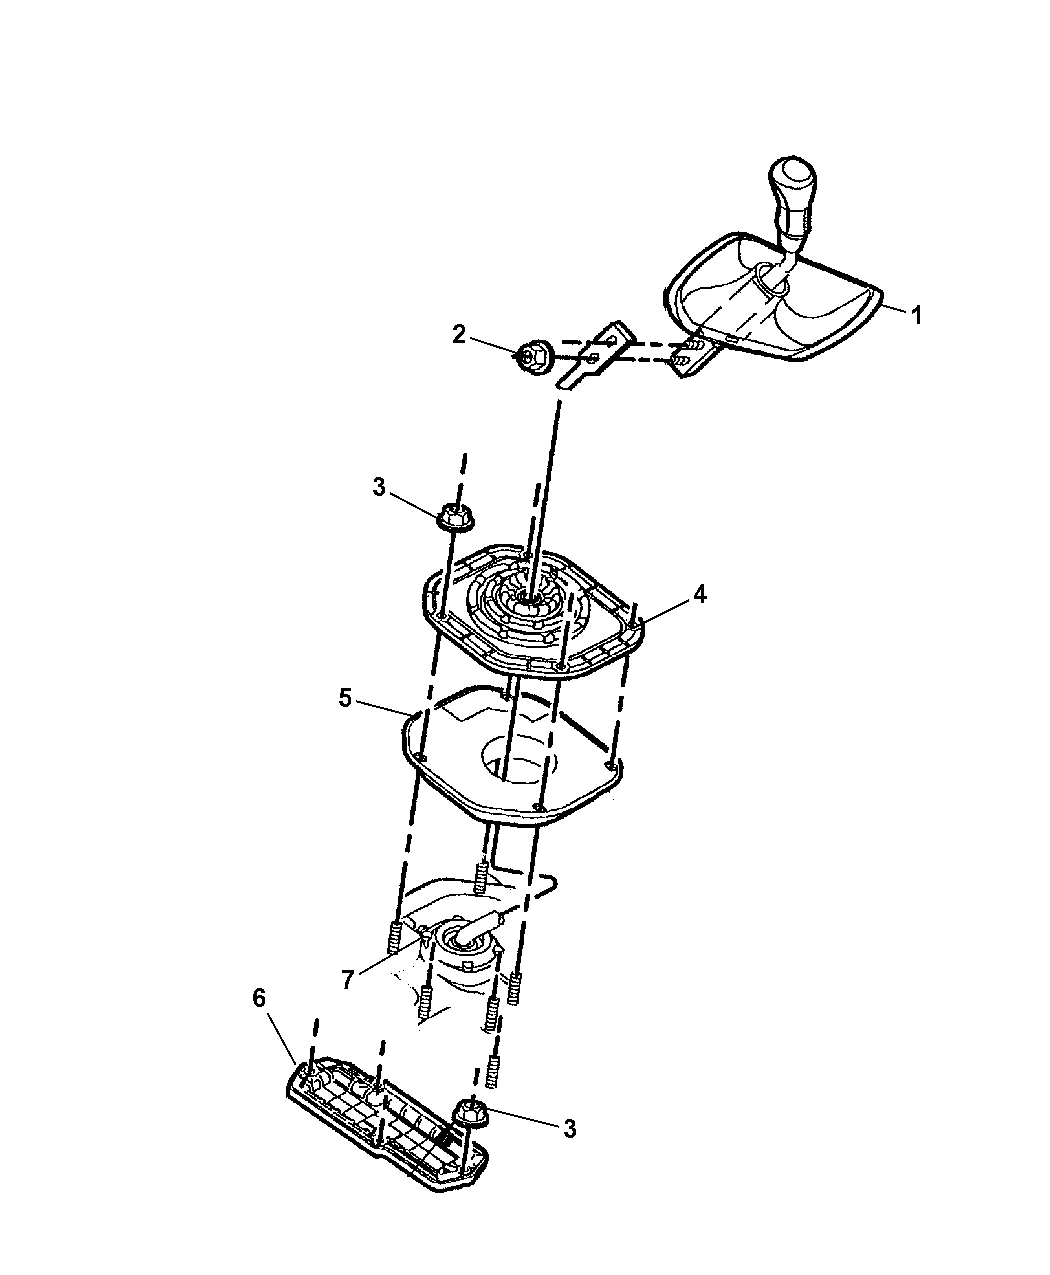 7 in the diagram below. 2005 Jeep Liberty Gear Shift Controls